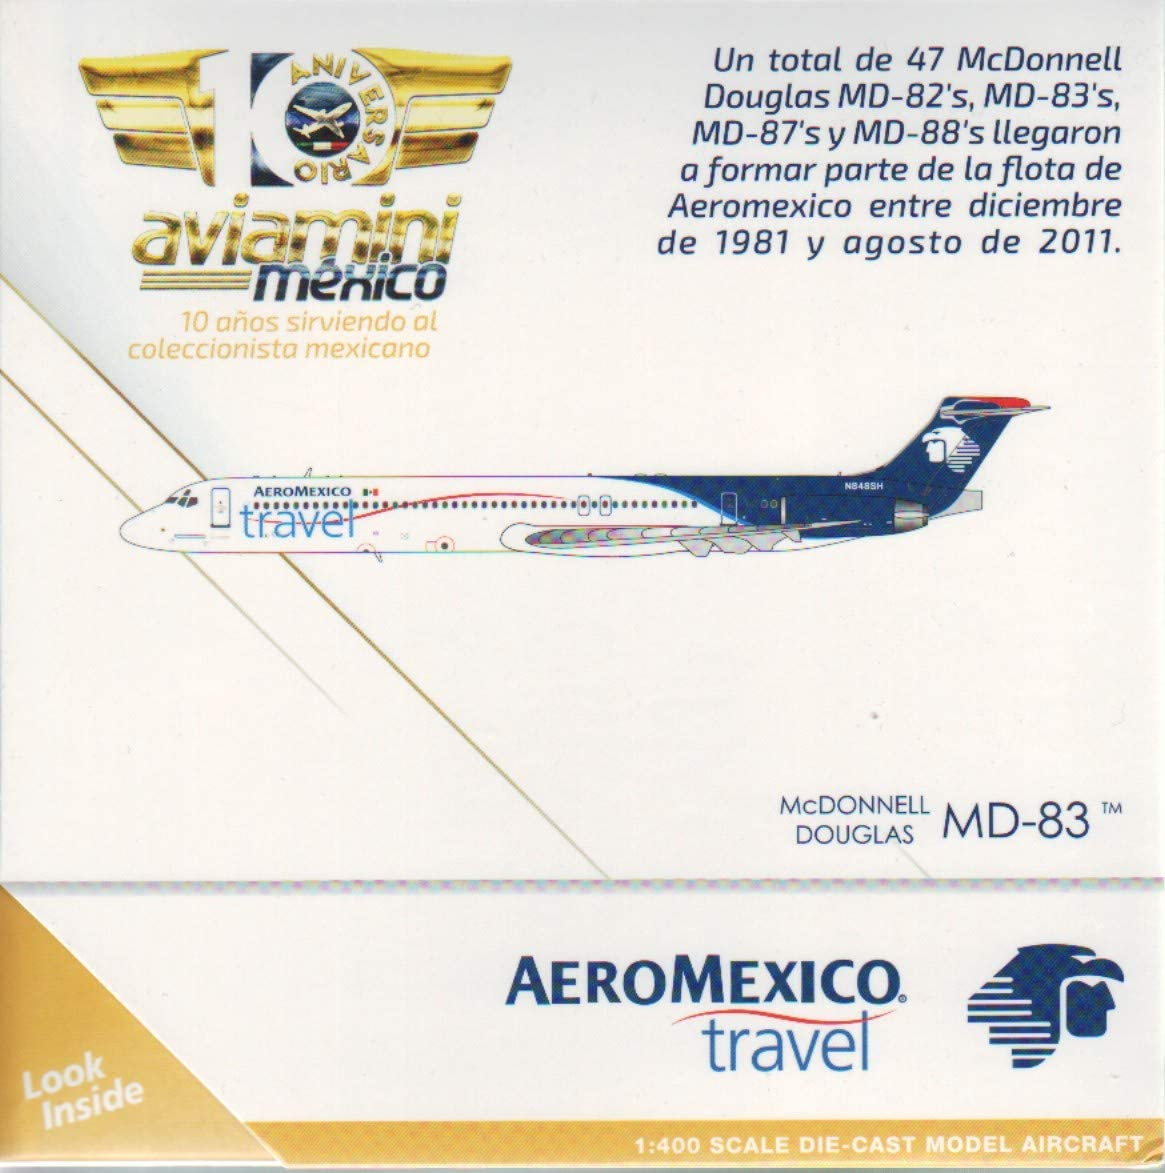 GeminiJets GEMGJ1434 1:400 AeroMexico SALE Douglas 大特価!! M Mcdonnell Travel